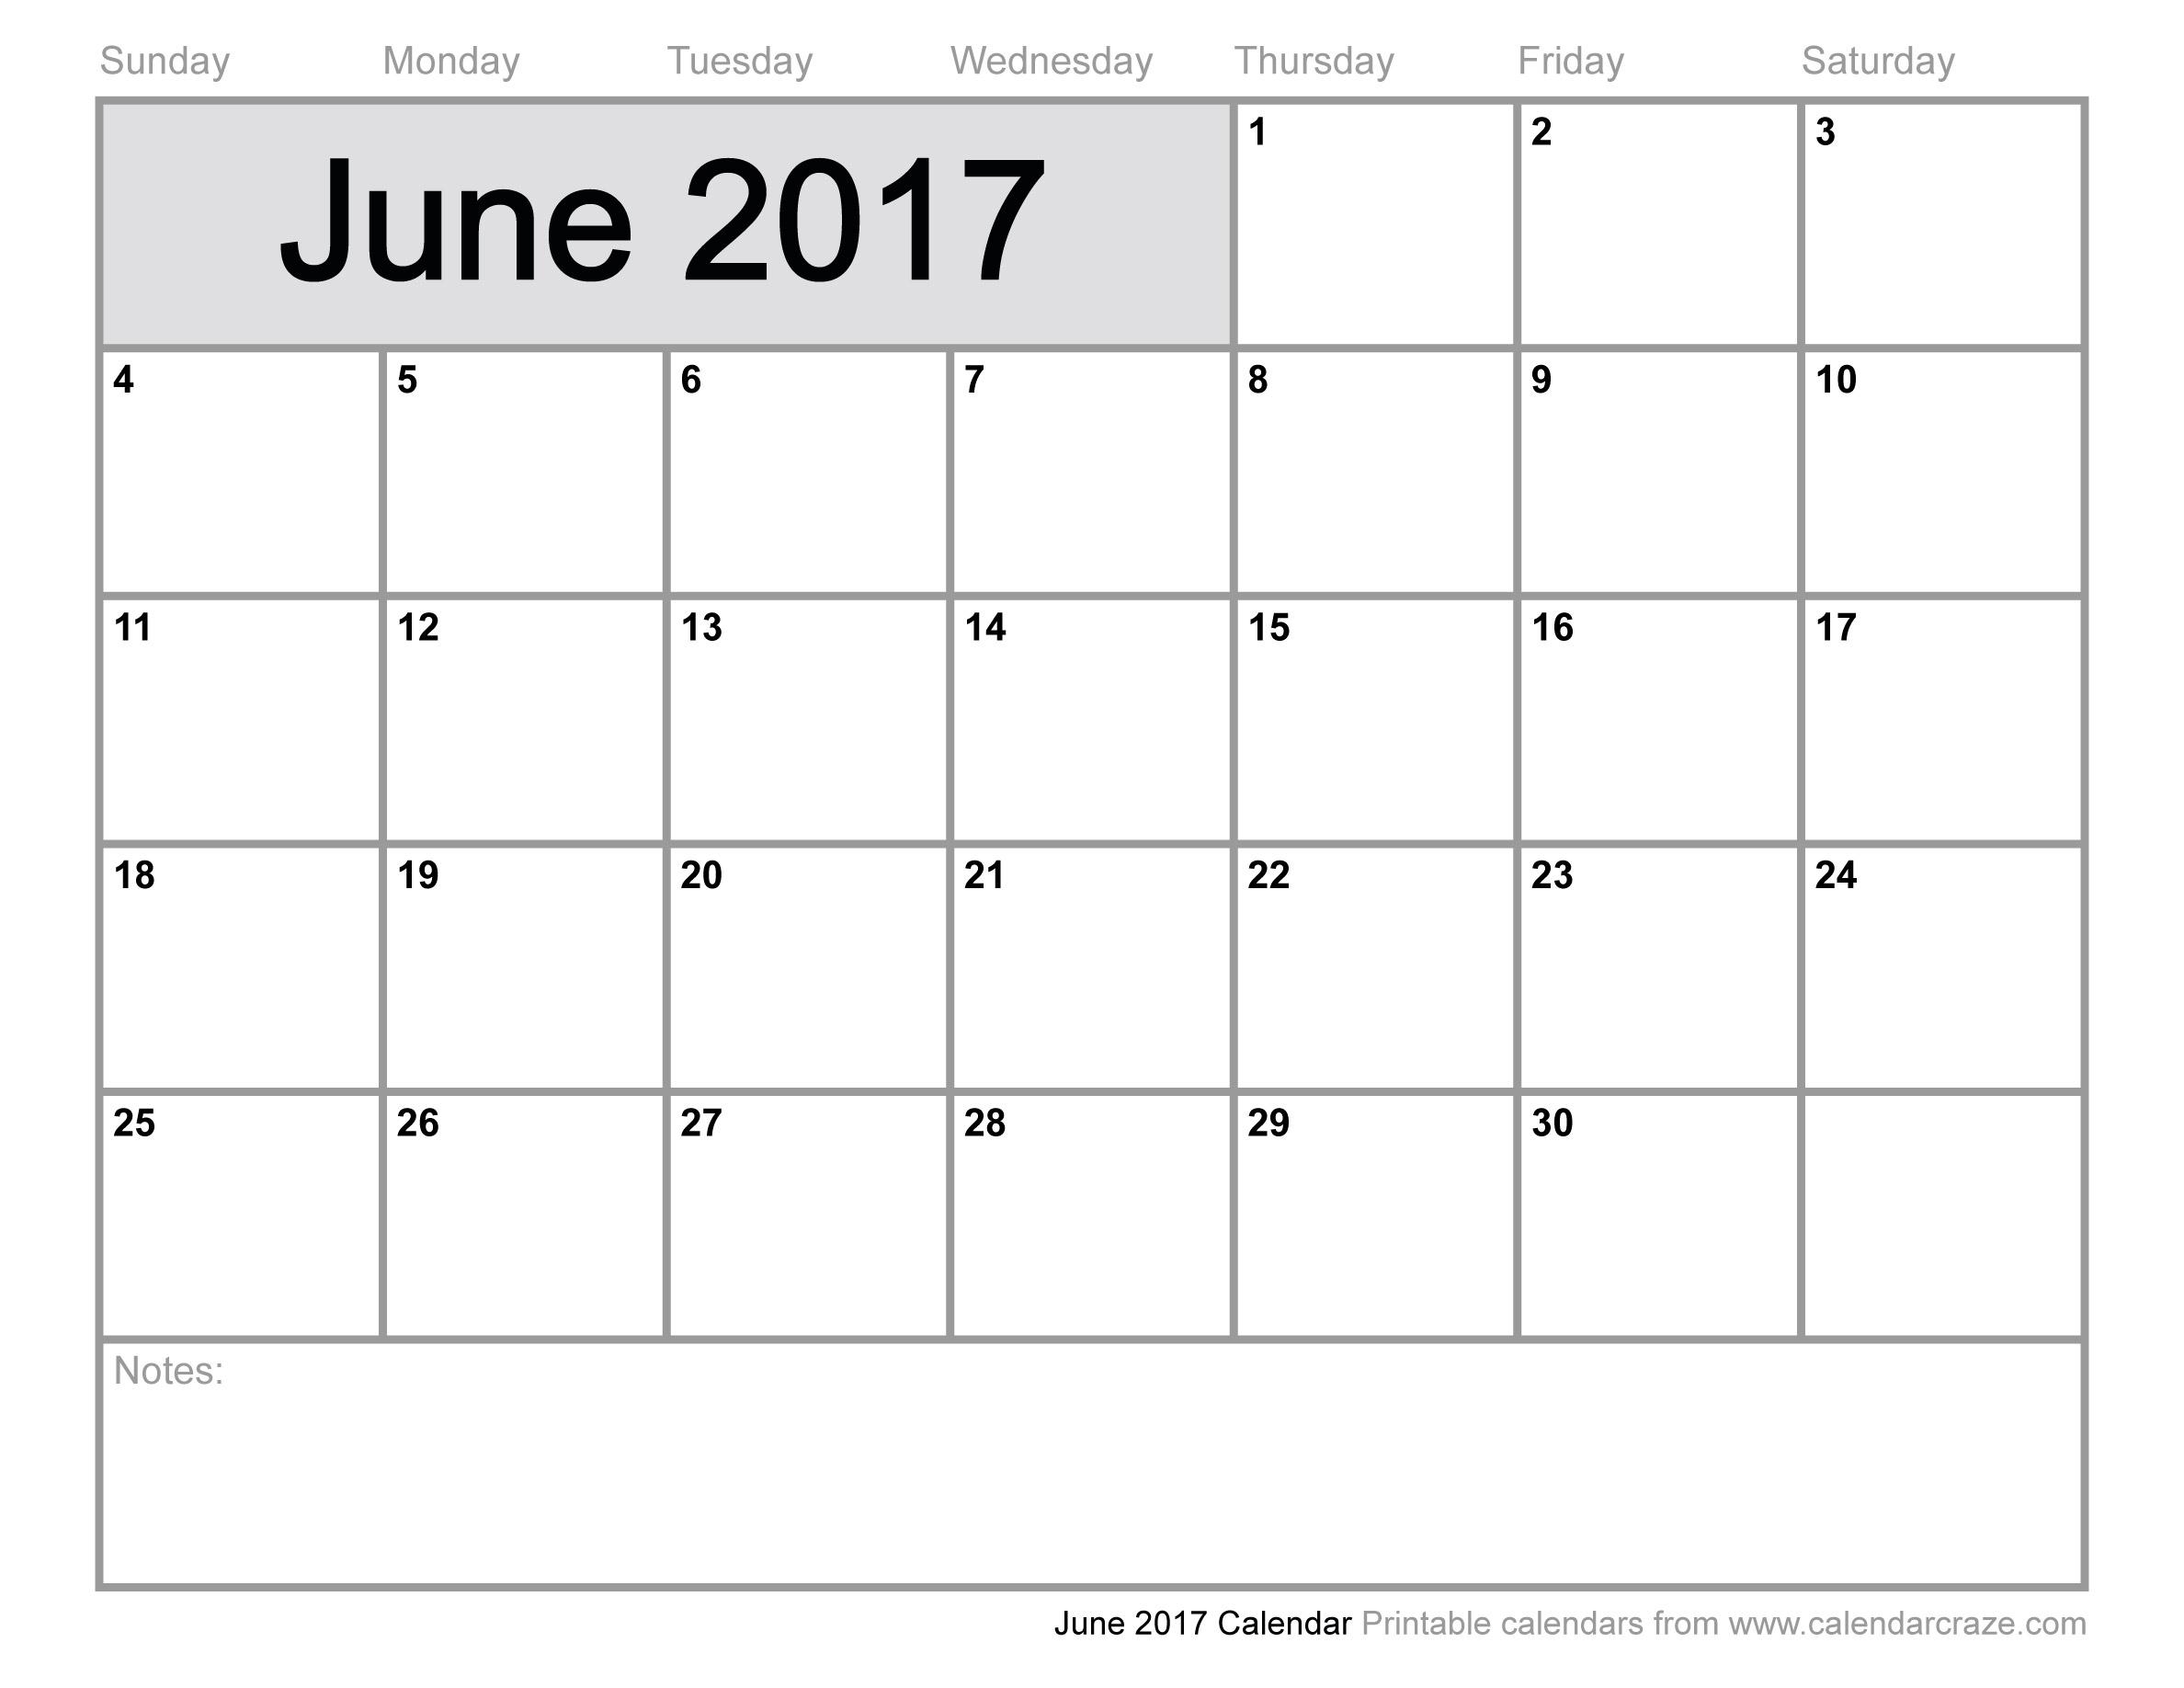 June calendar clipart picture transparent June 2017 Calendar Clipart picture transparent